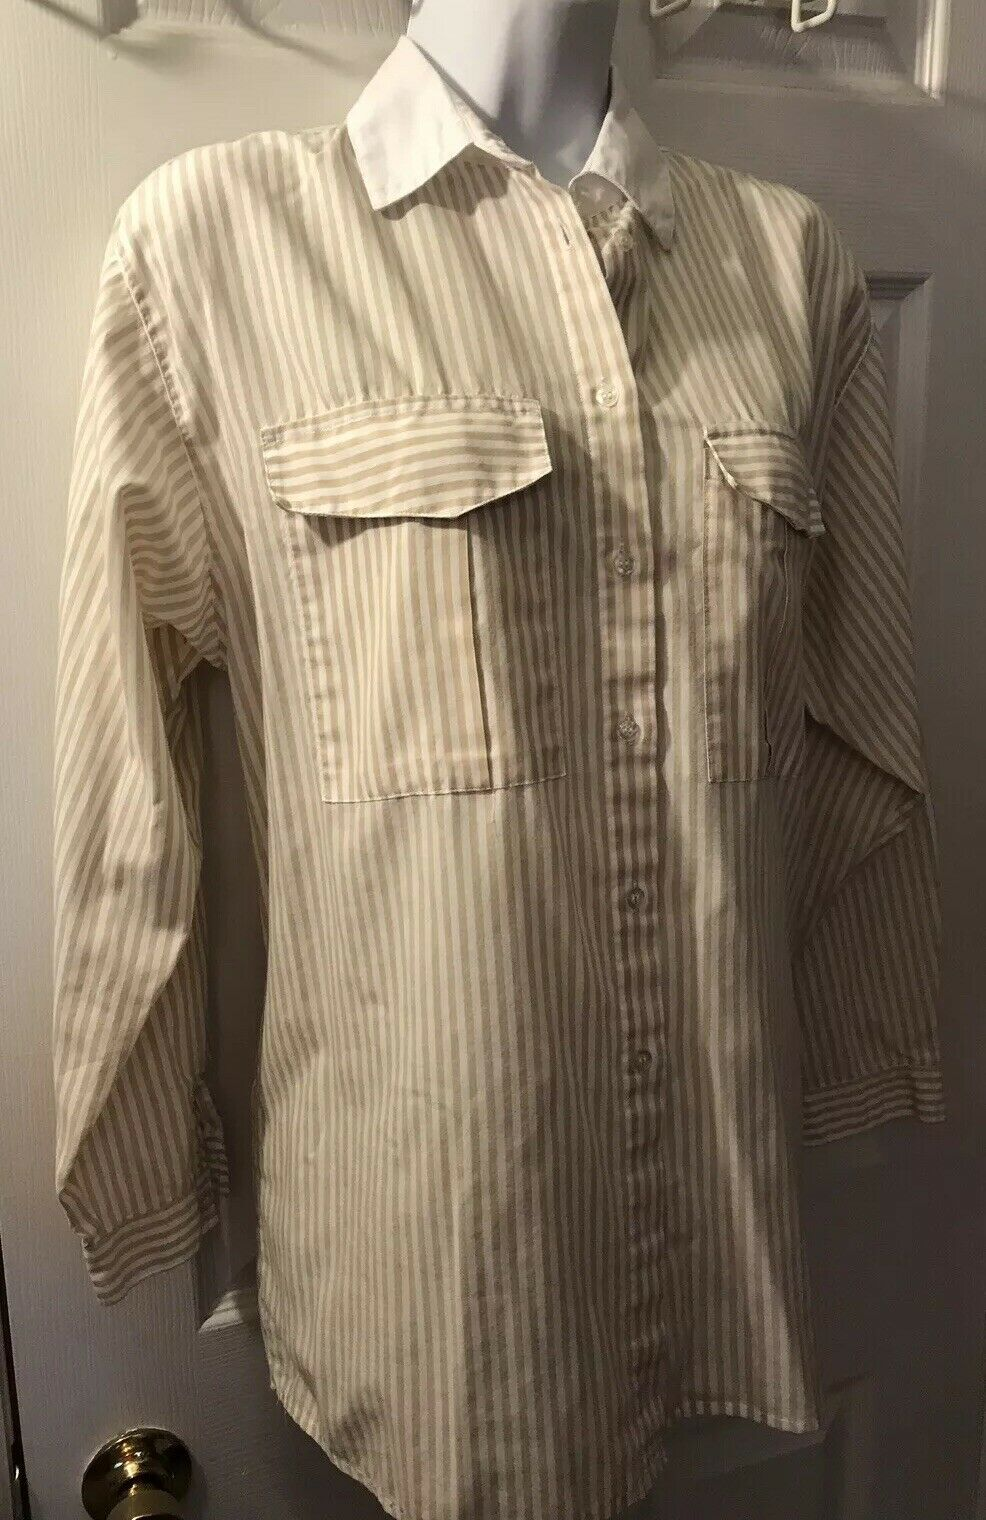 Vtg DIANE VON FURSTENBERG Striped Button Down Shirt DVF White Tan Blouse Top 14 image 2